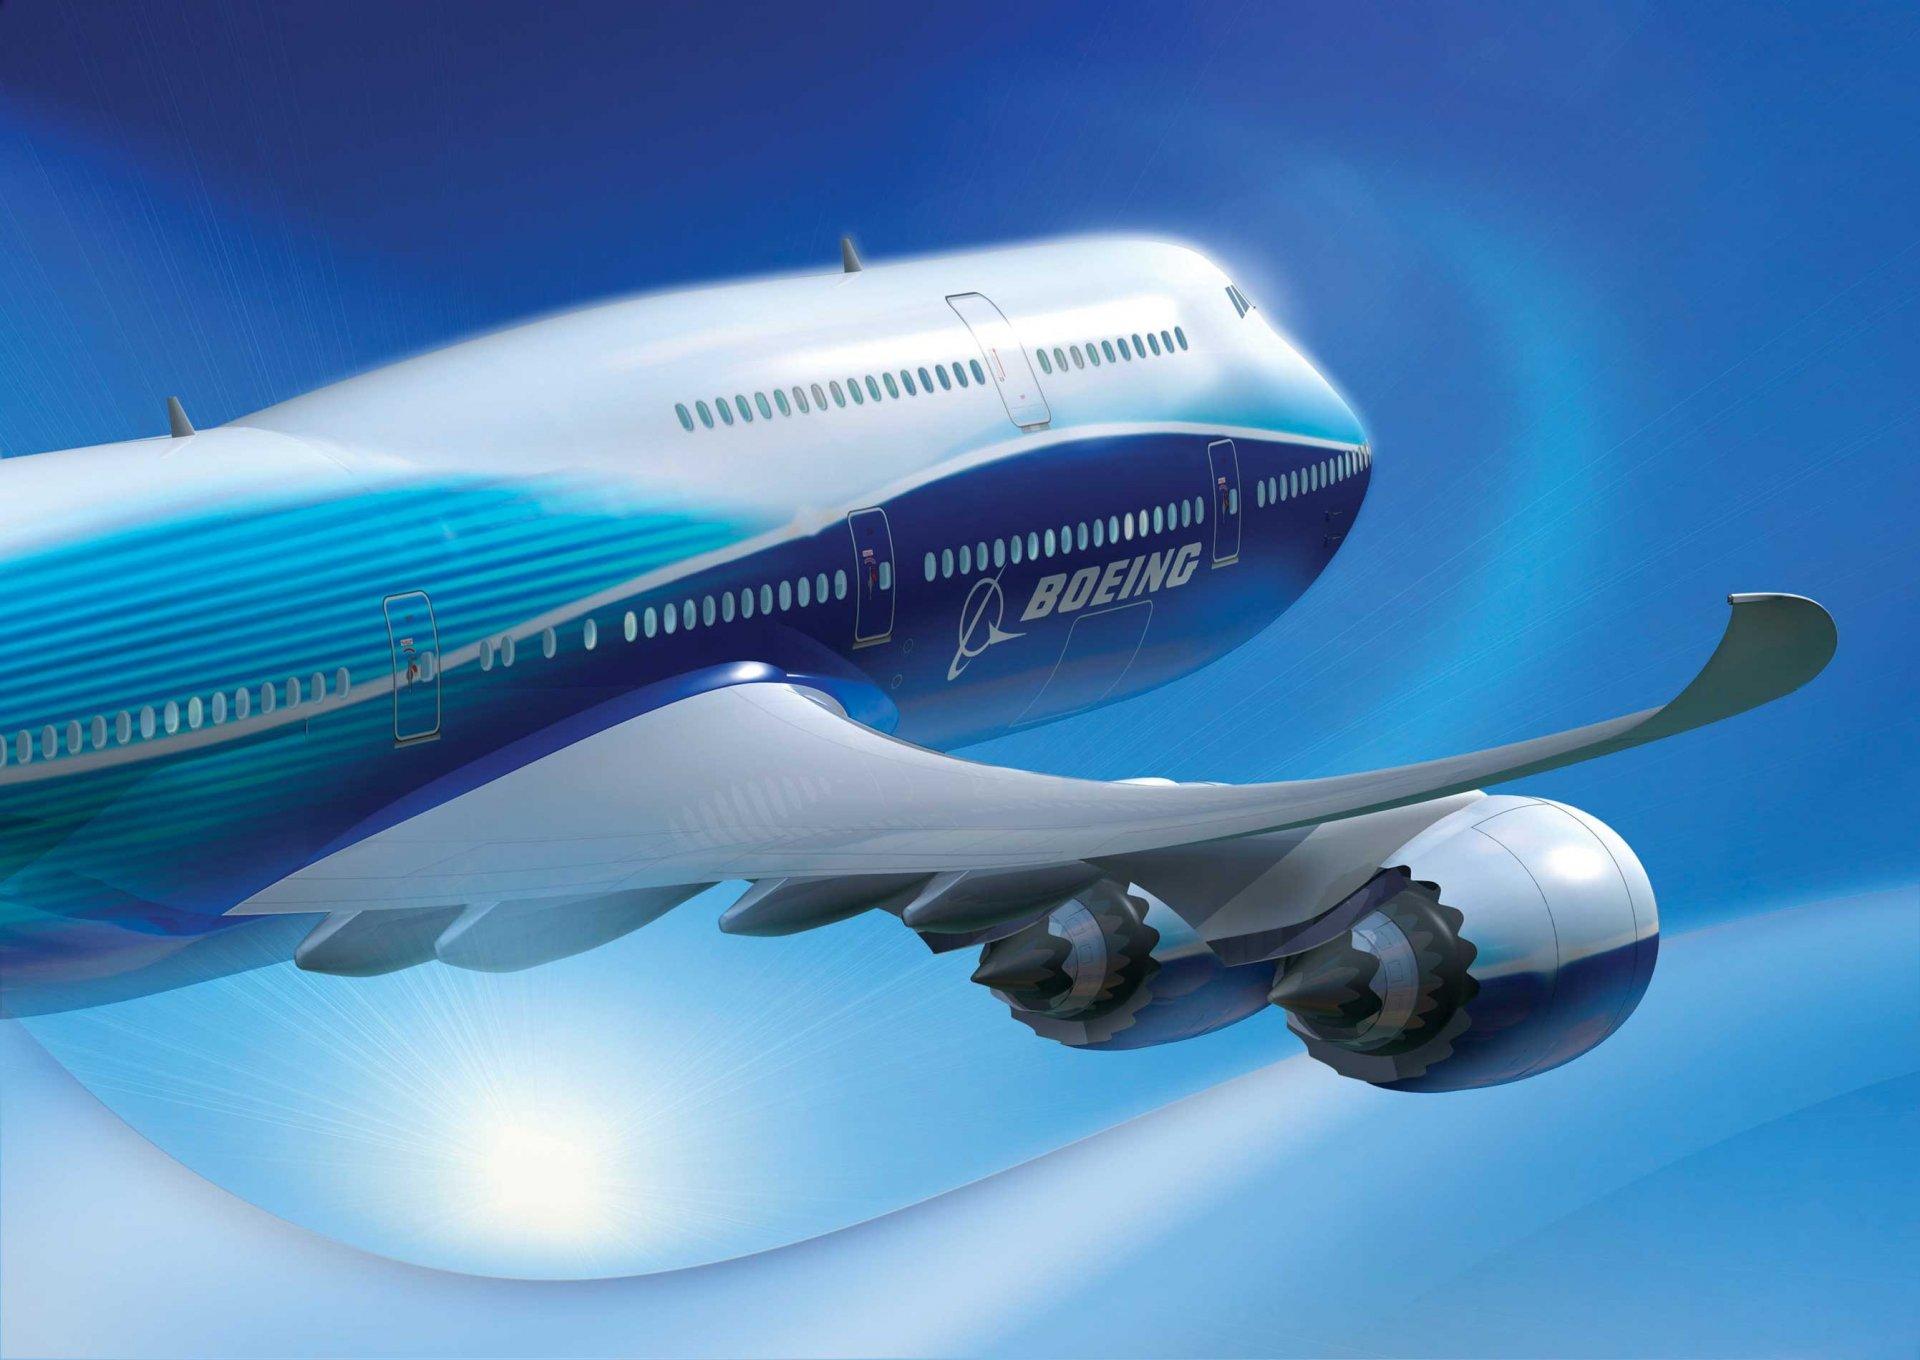 Обои 8, Самолёт, люфтганза, Lufthansa, 747, boeing, боинг, пассажирский. Авиация foto 11